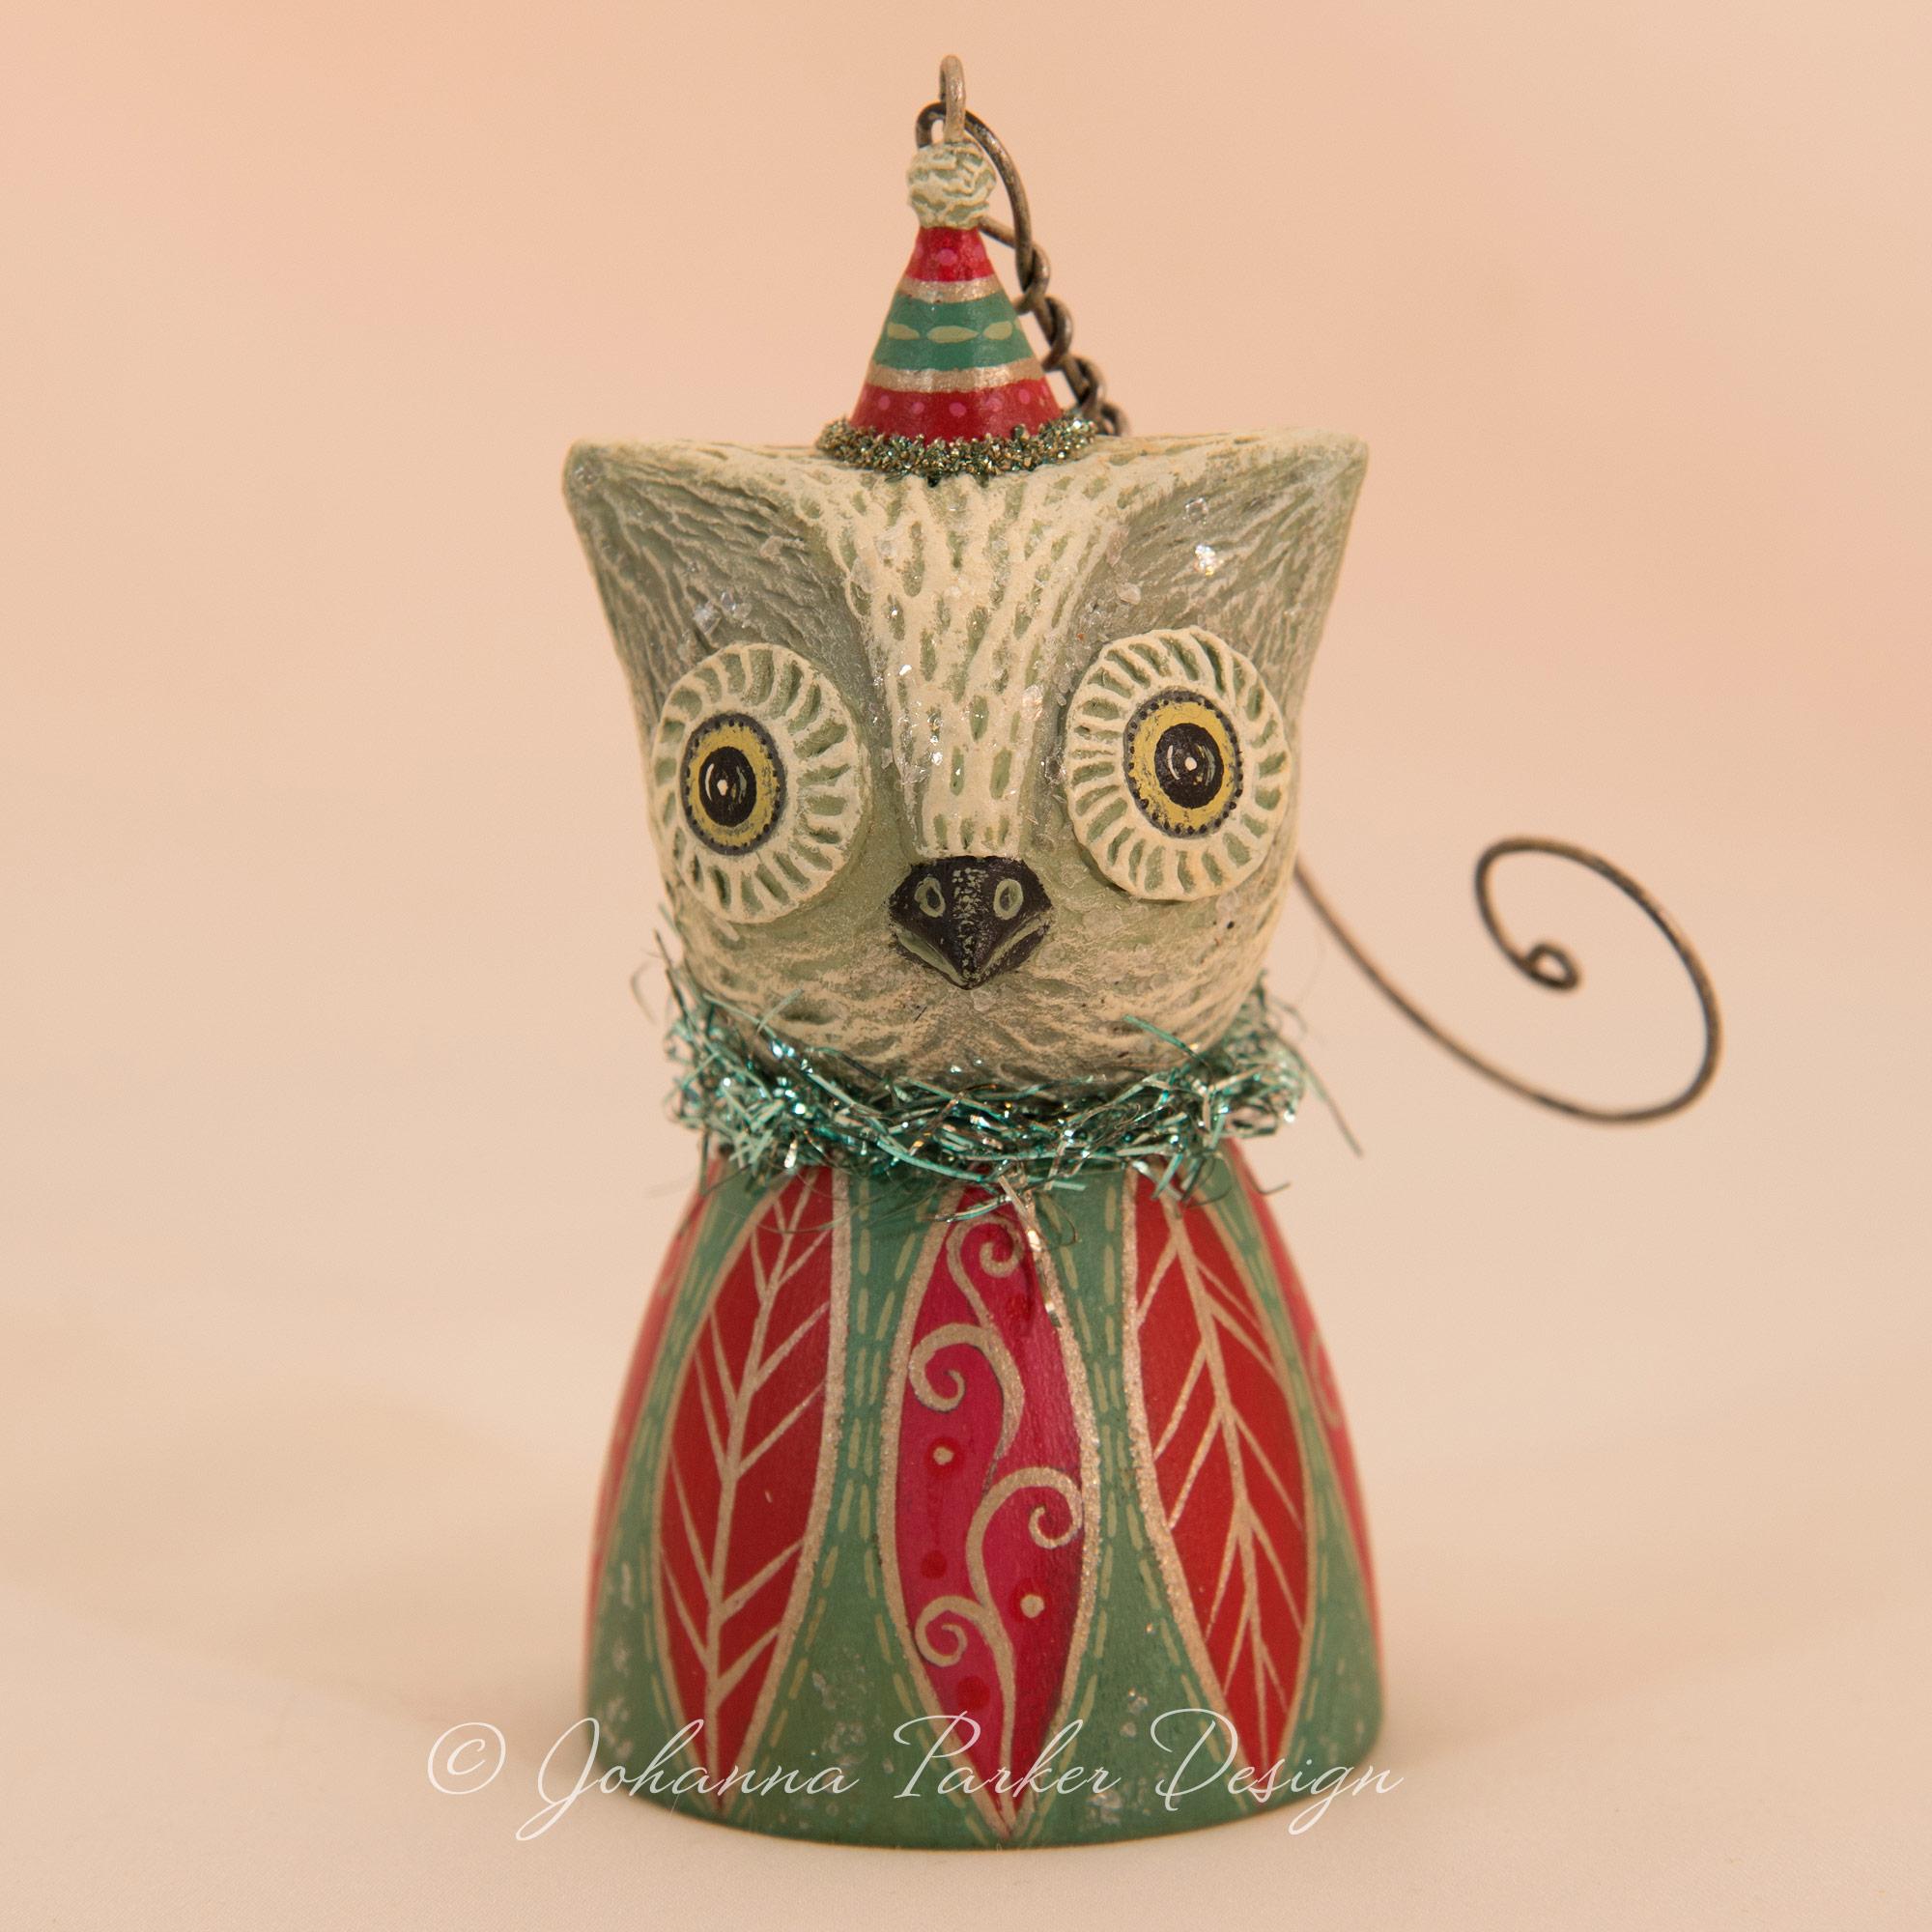 Johanna-Parker-Owl-Feathers-Bell-Ornament-1.jpg